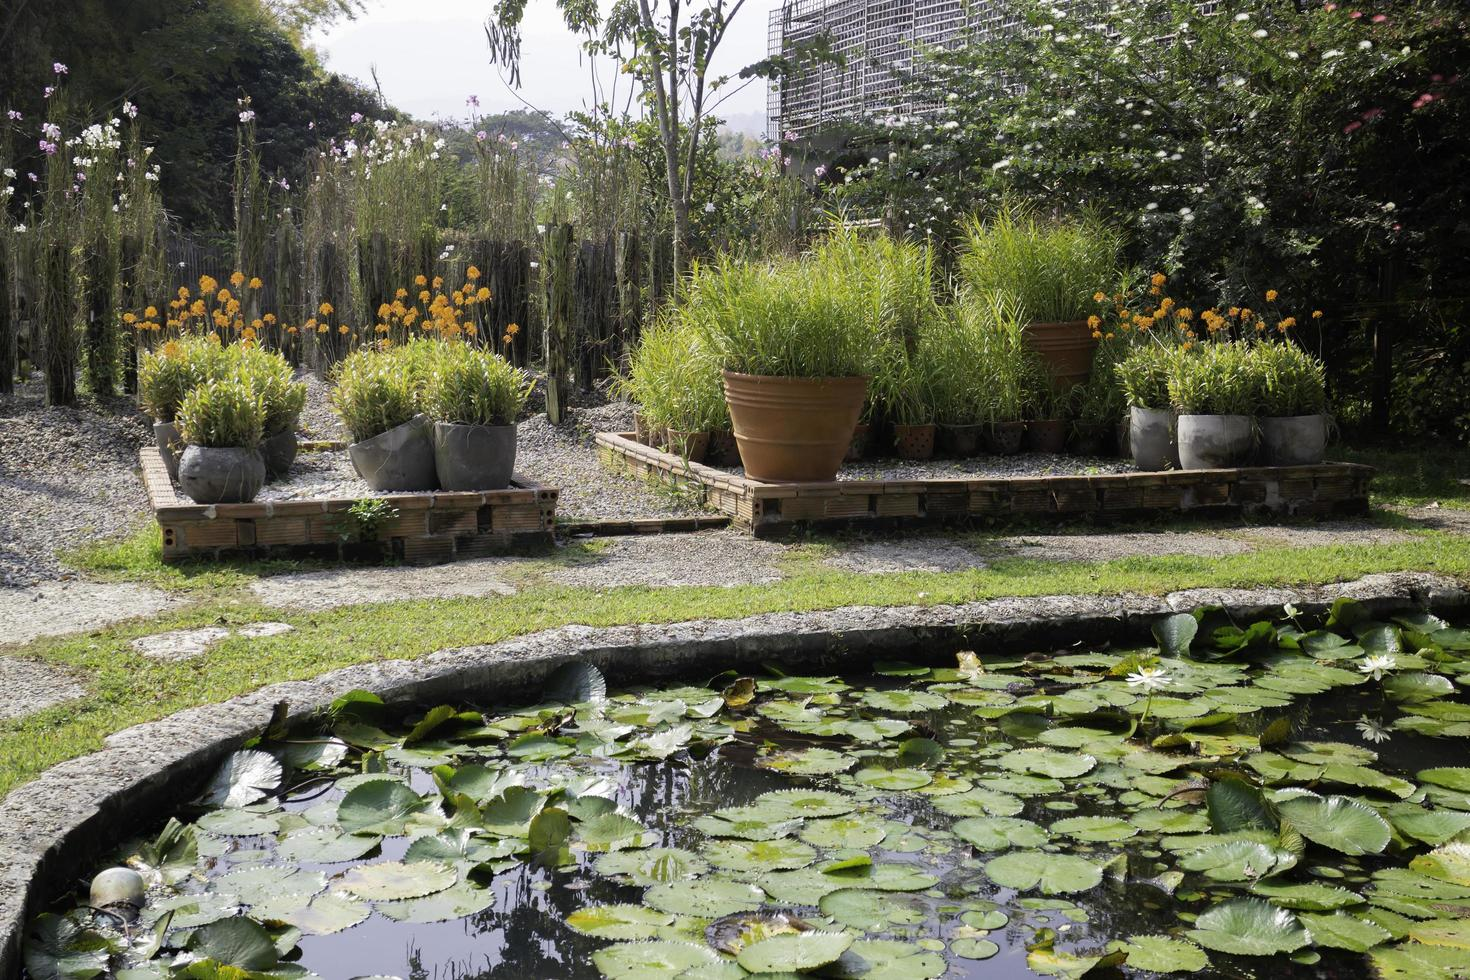 beau jardin avec un étang photo